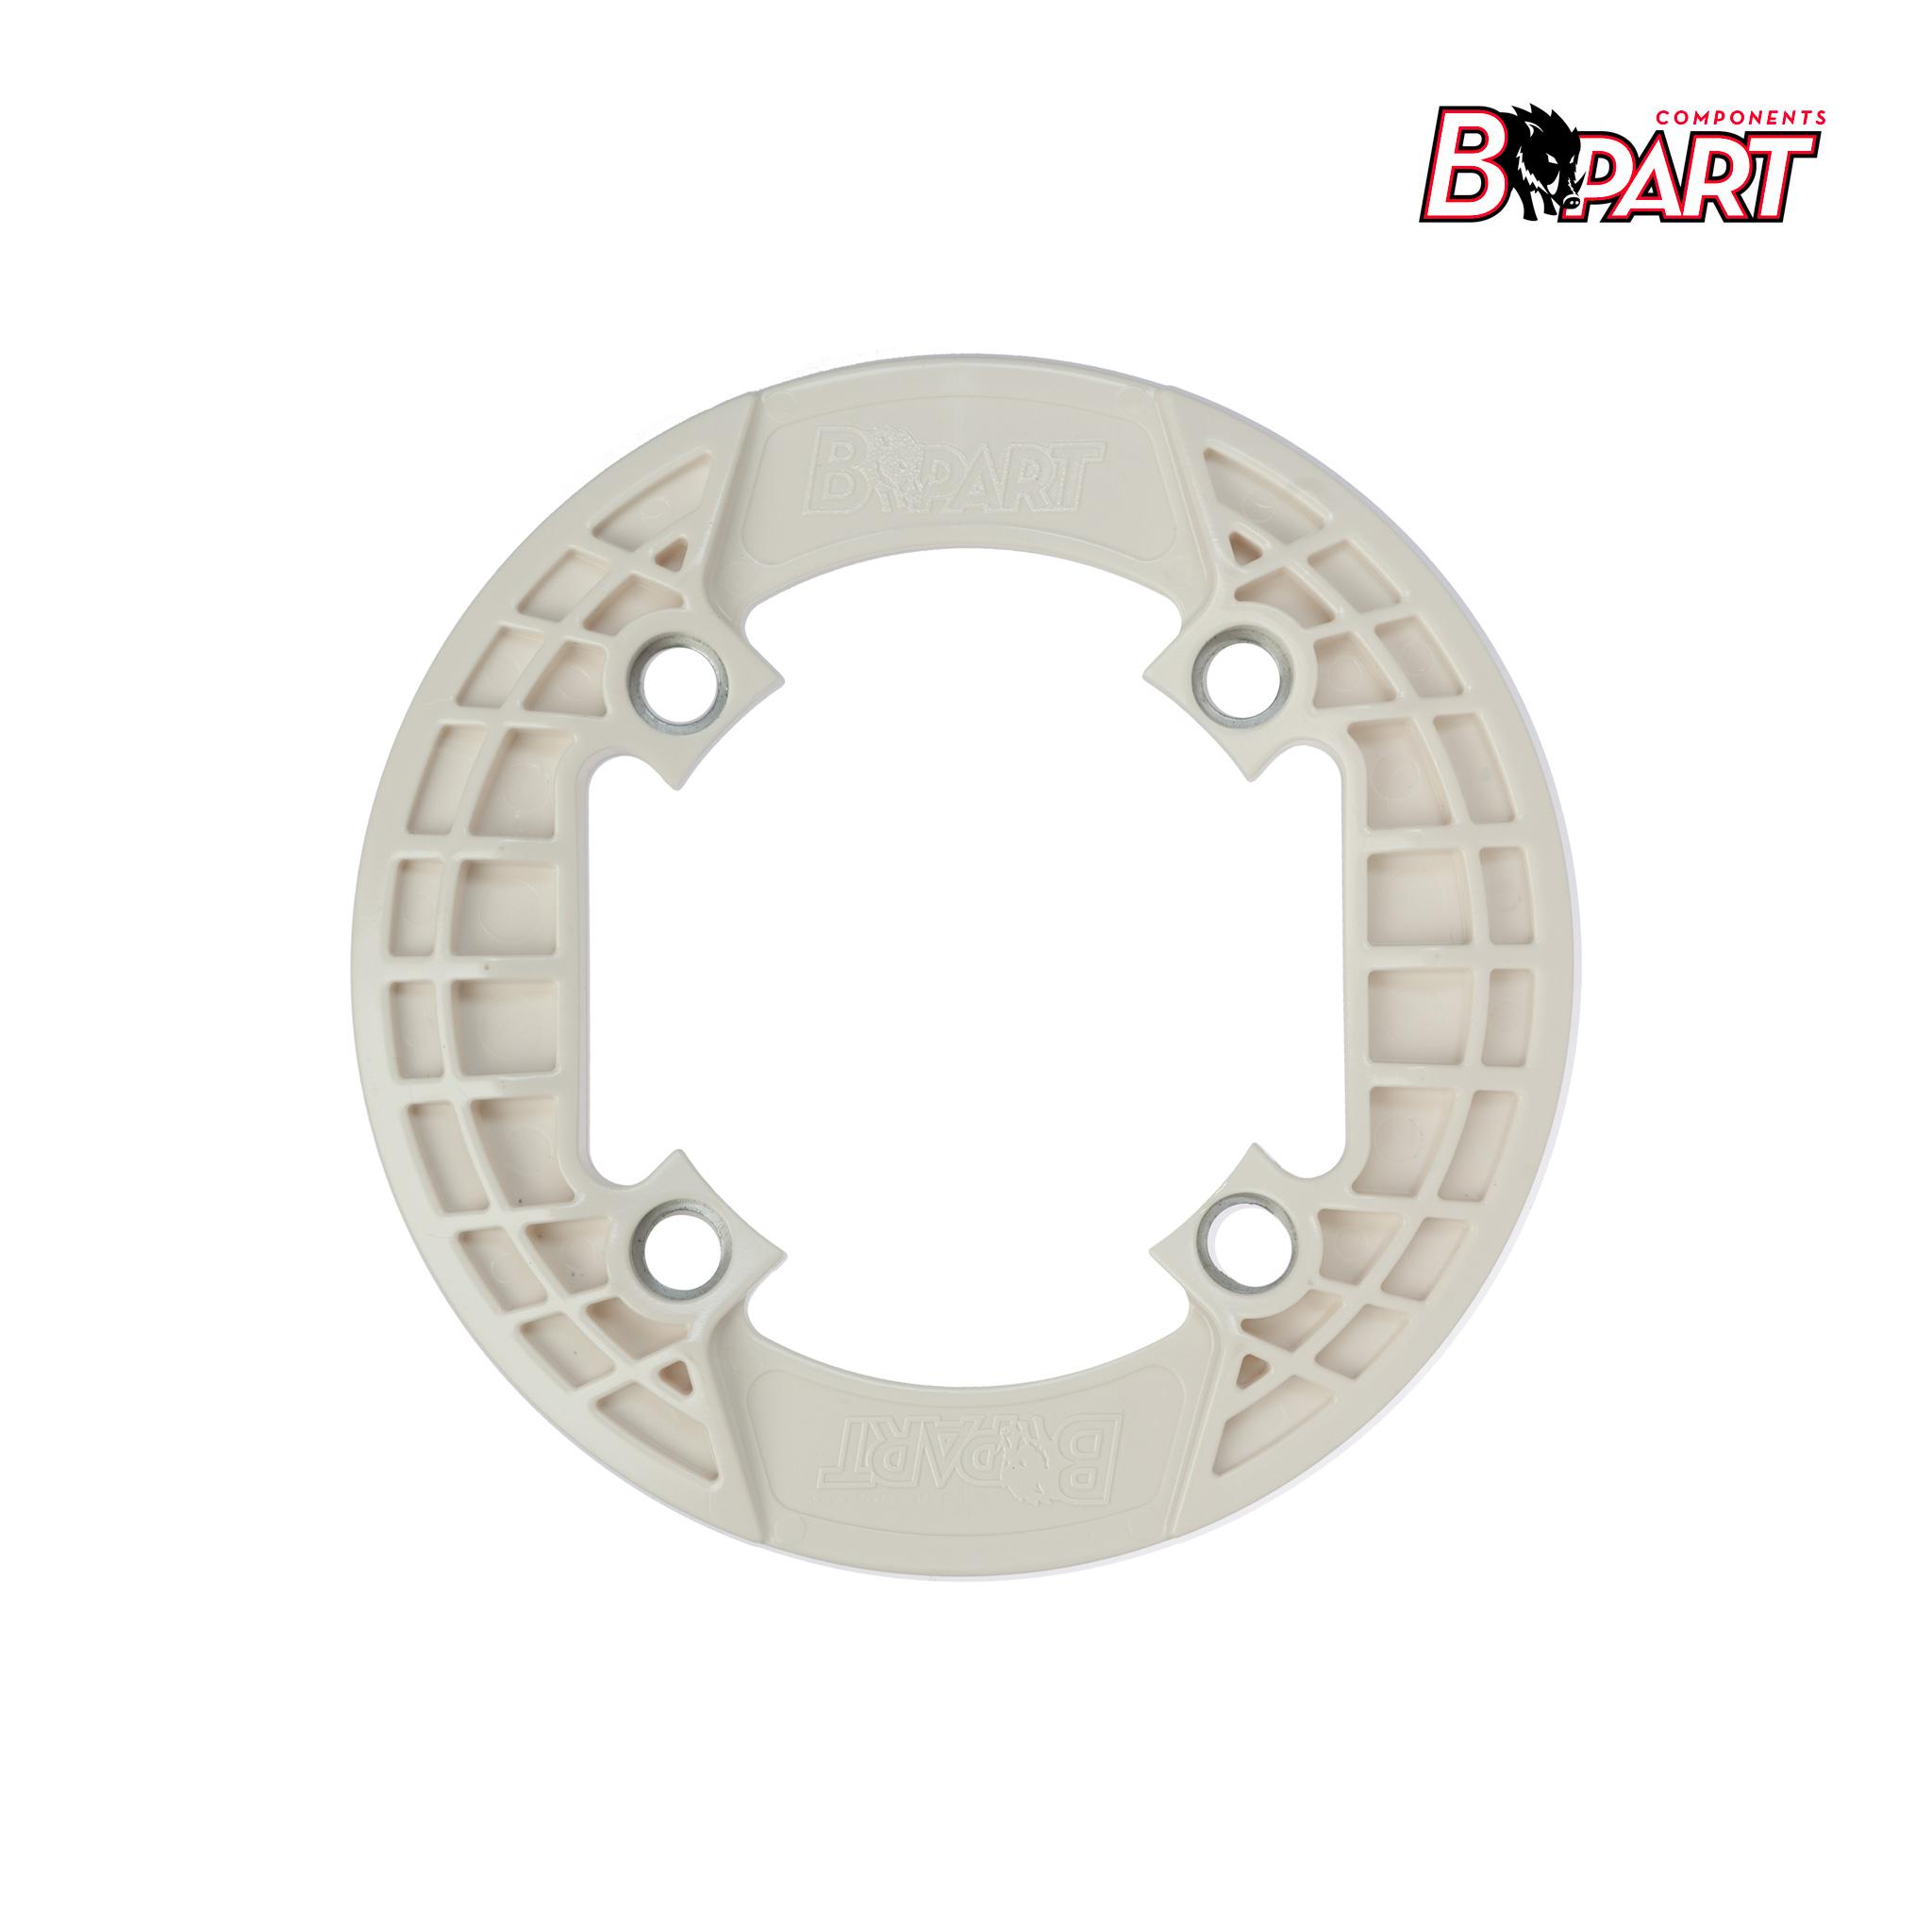 Bpart Components cubreplatos blanco